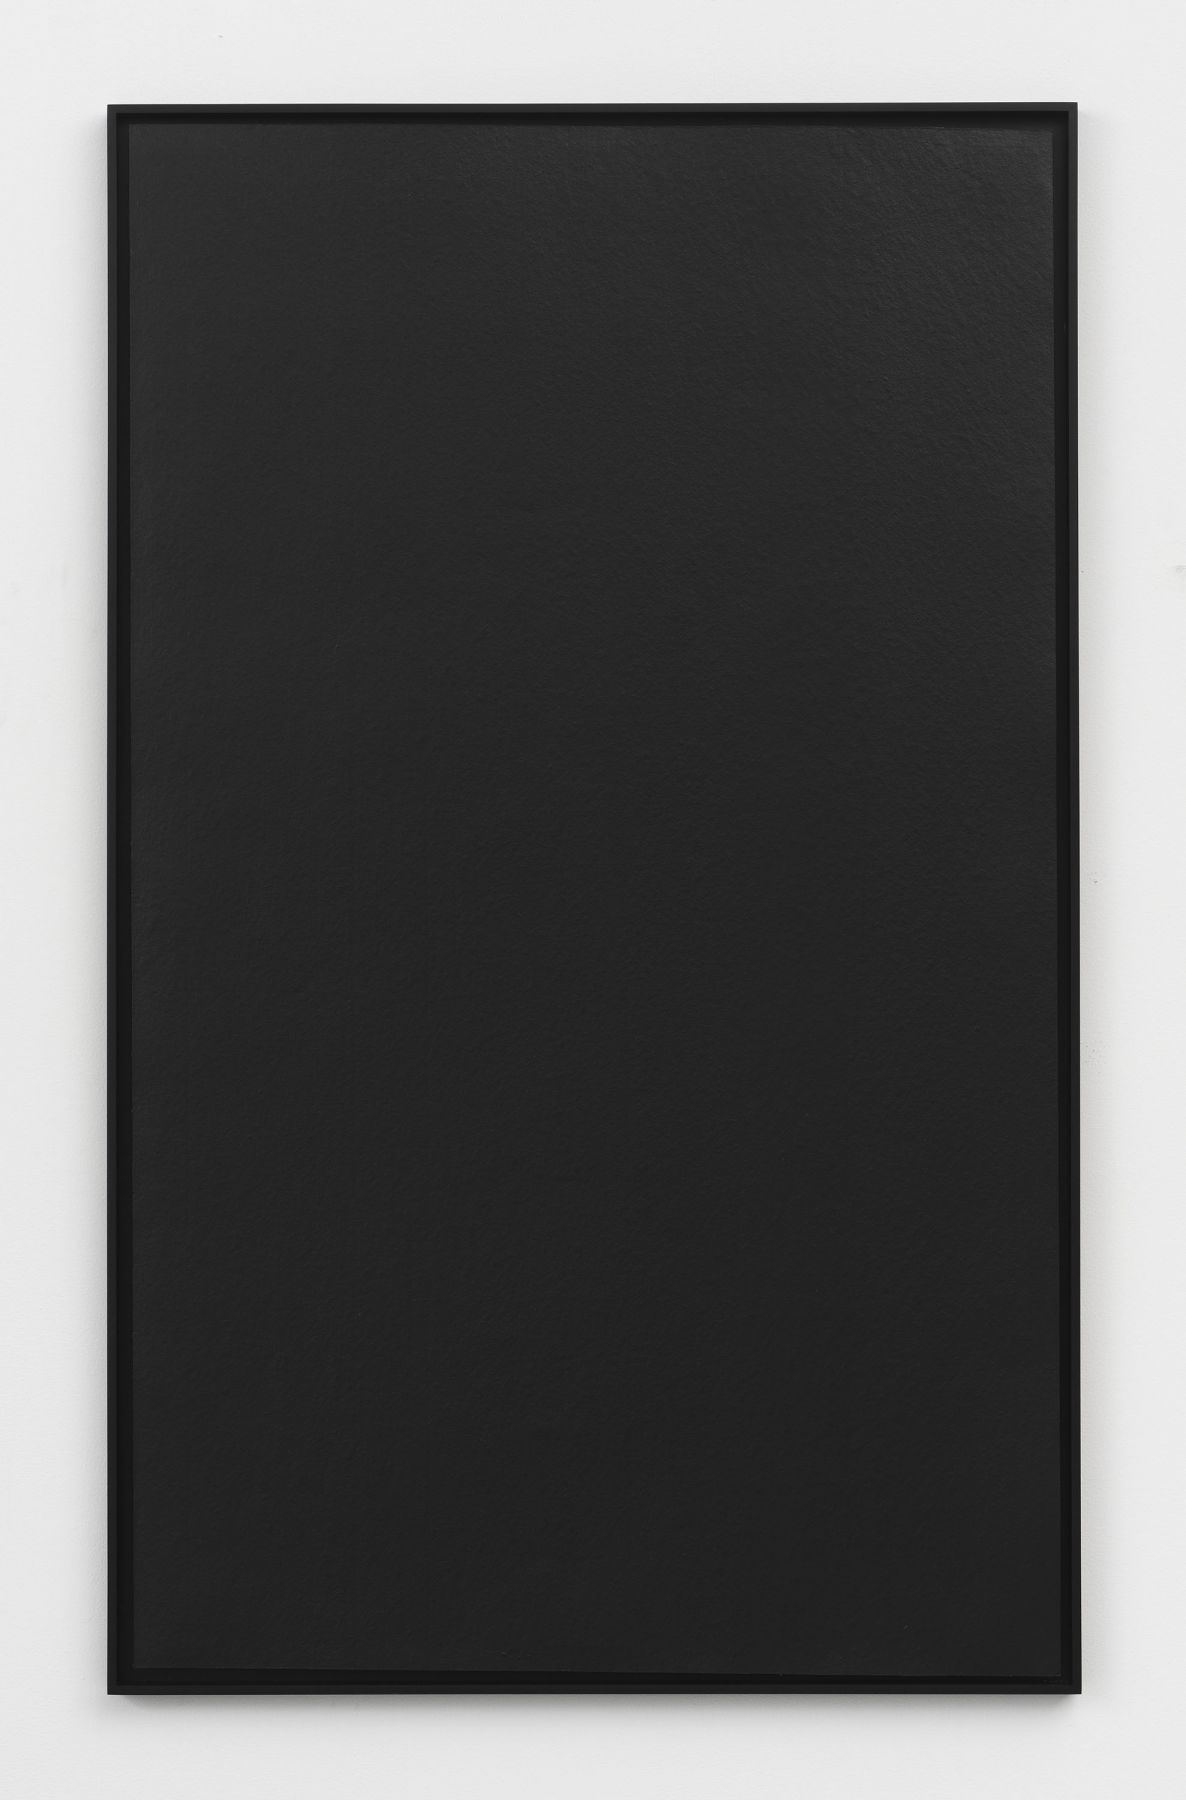 Variations (Black Magic), 2018